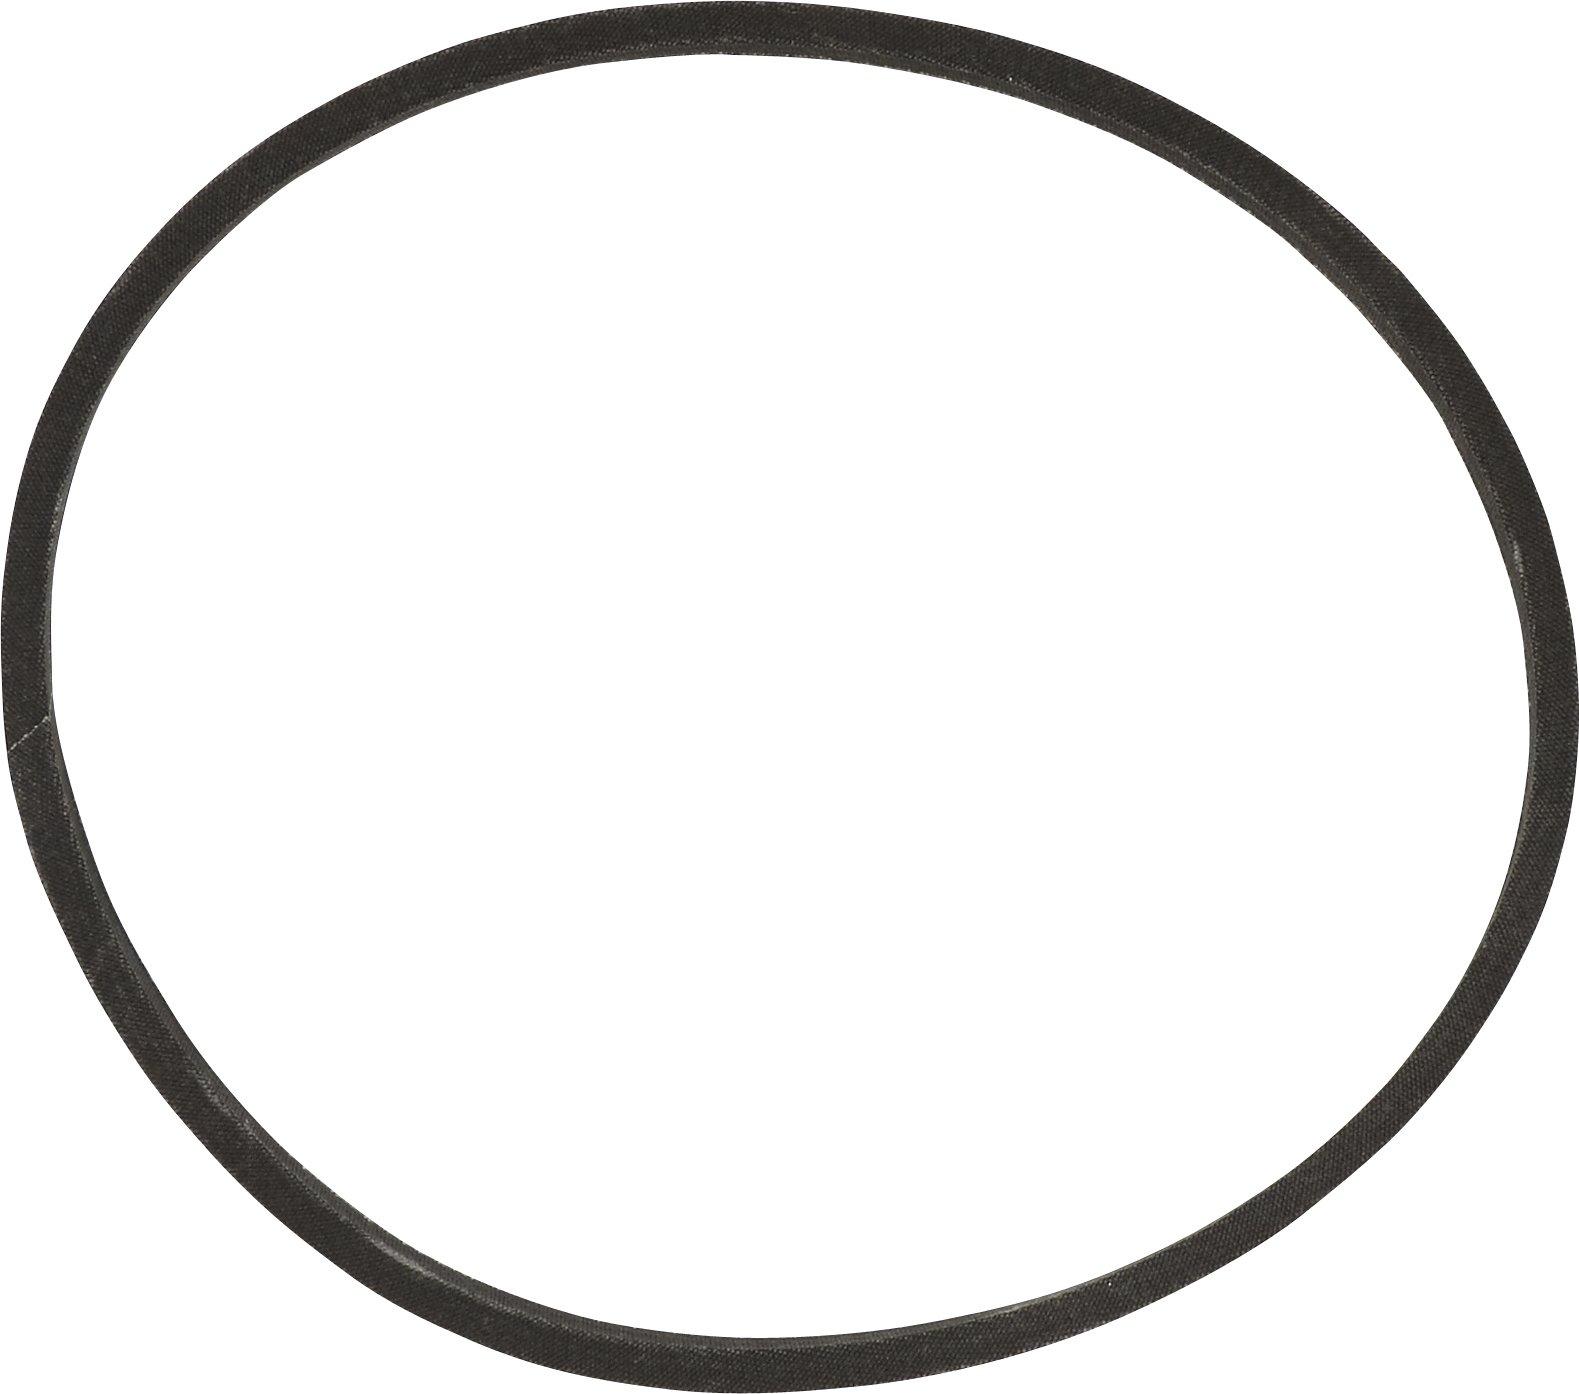 Whirlpool 27001006 Flat Belt